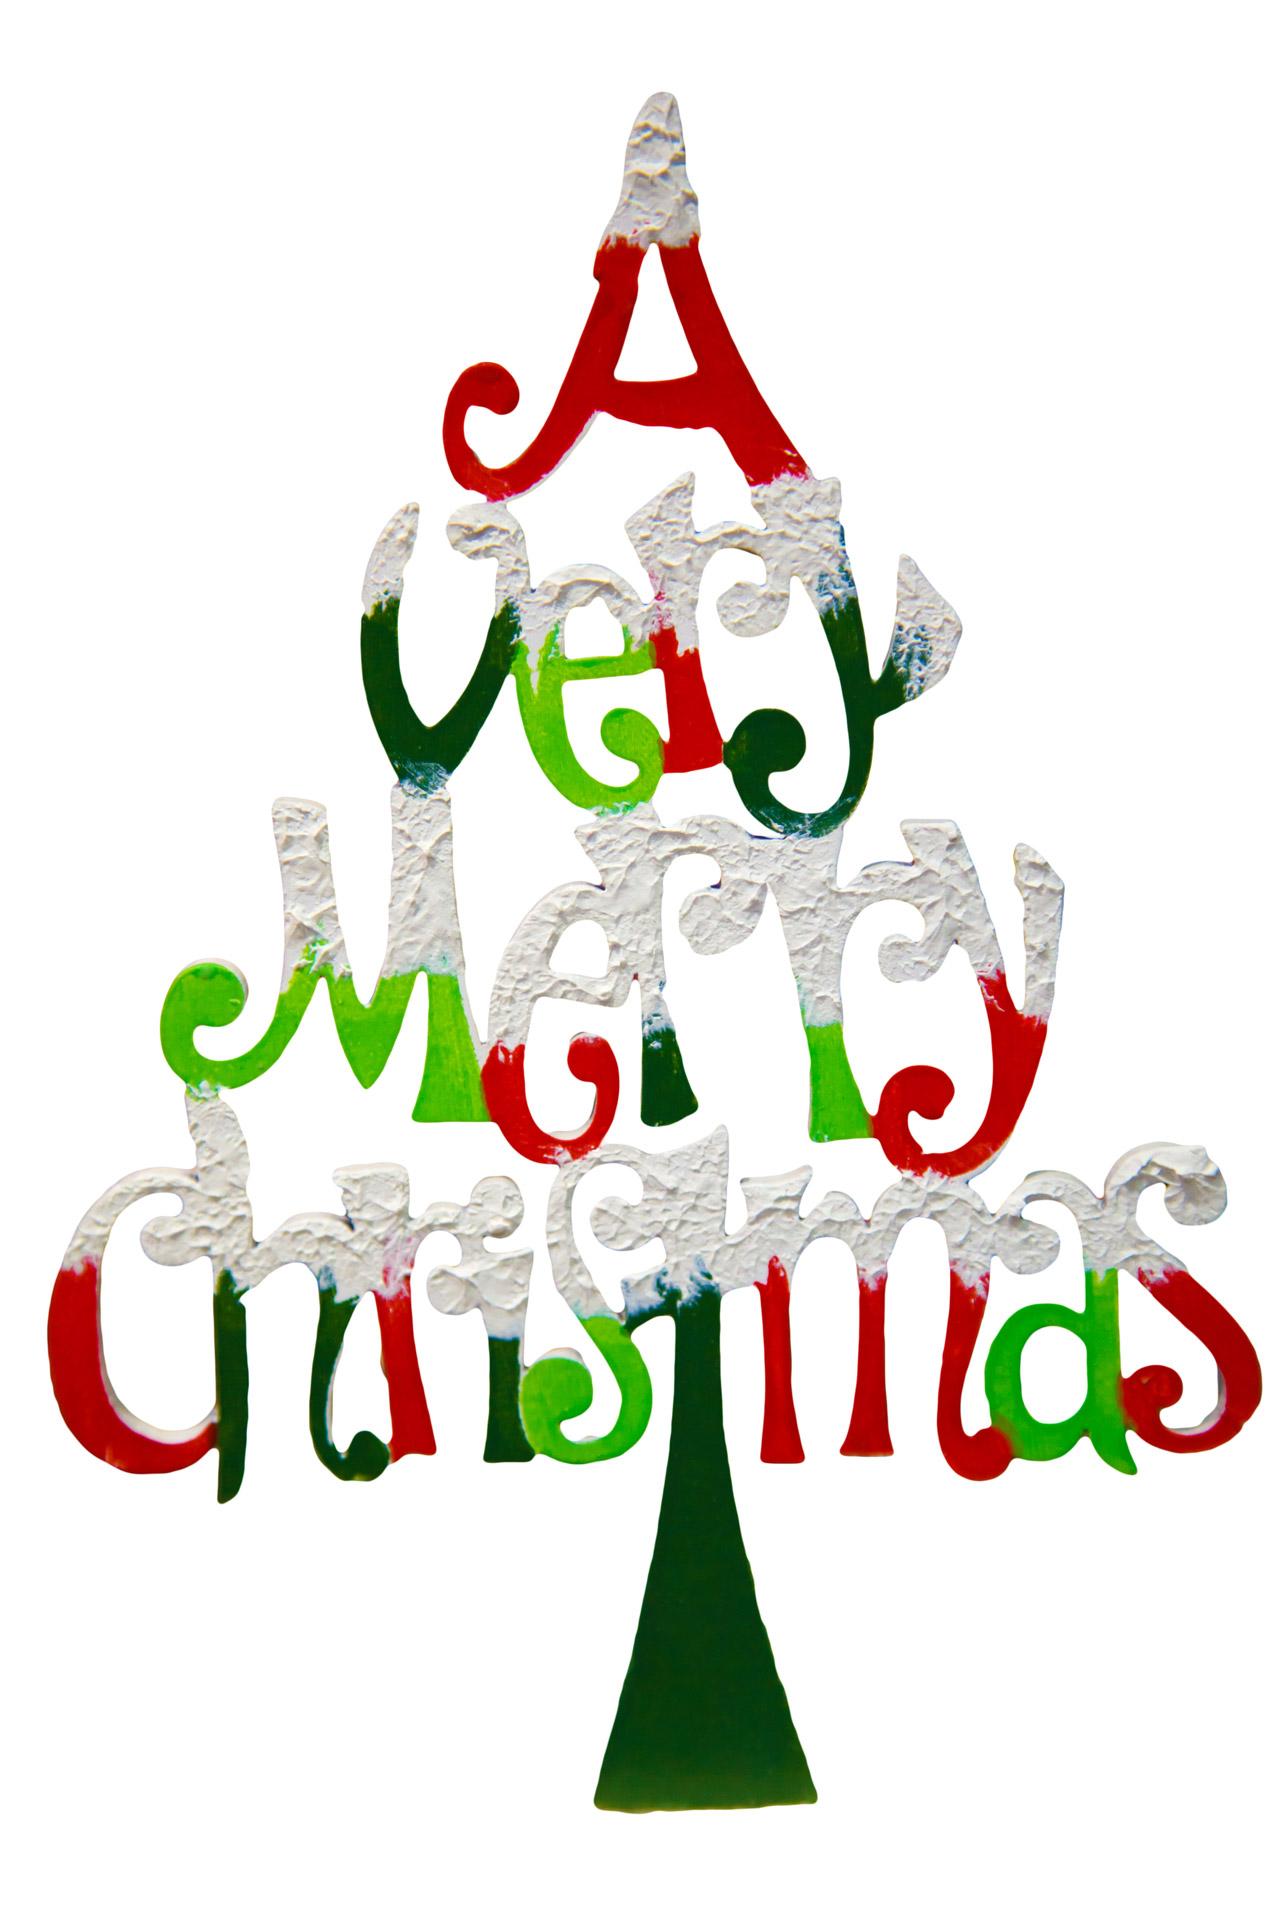 1280x1920 Animated Christmas Clipart